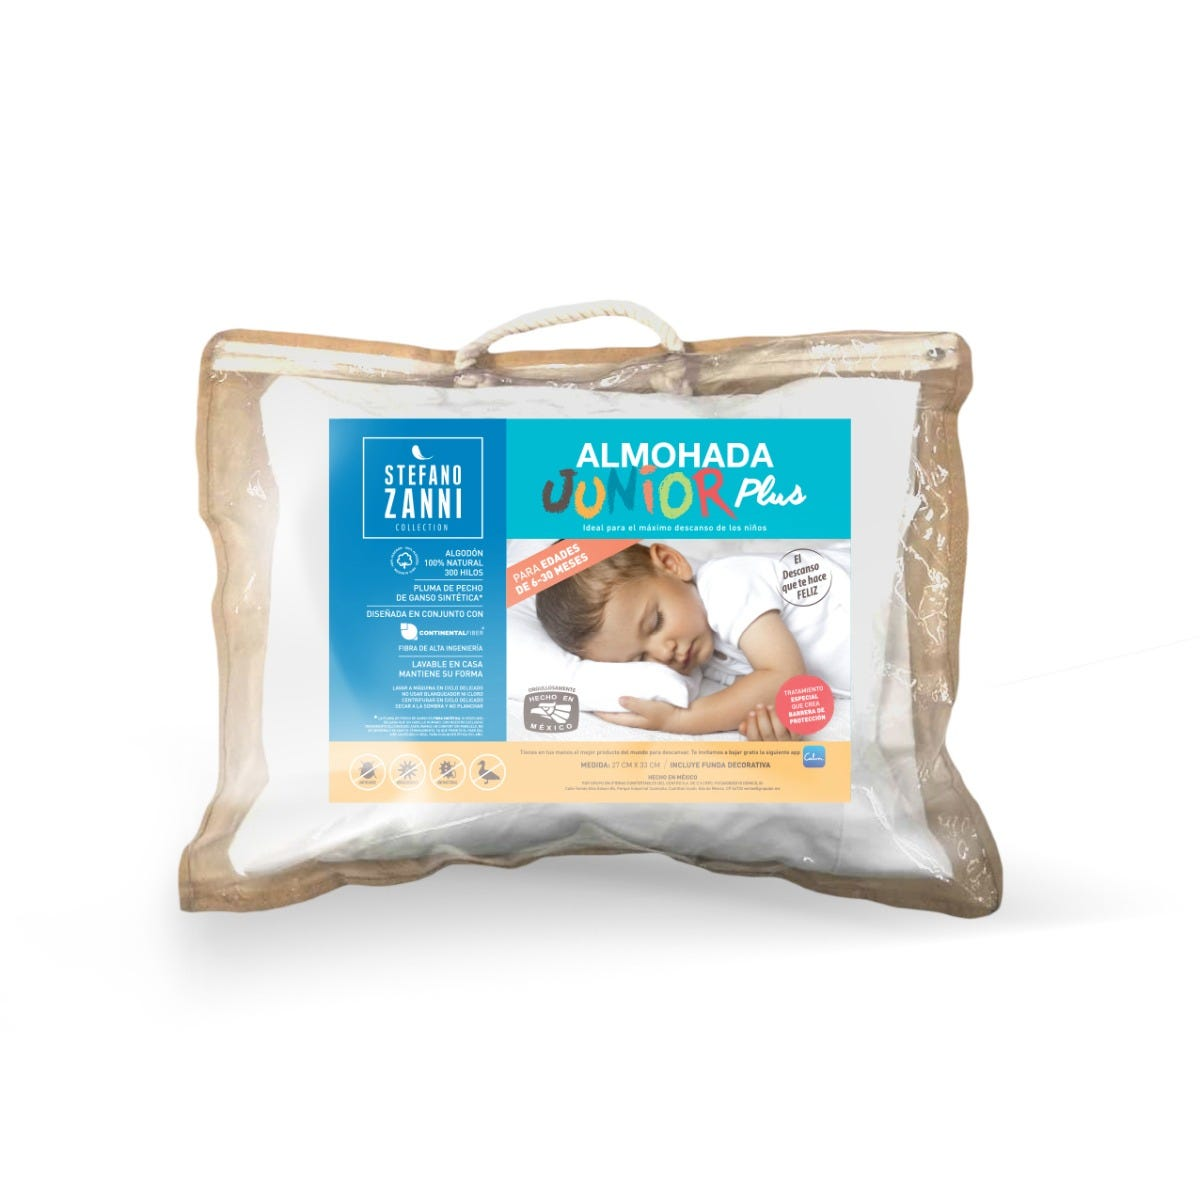 Almohada para bebé Stefano Zanni®